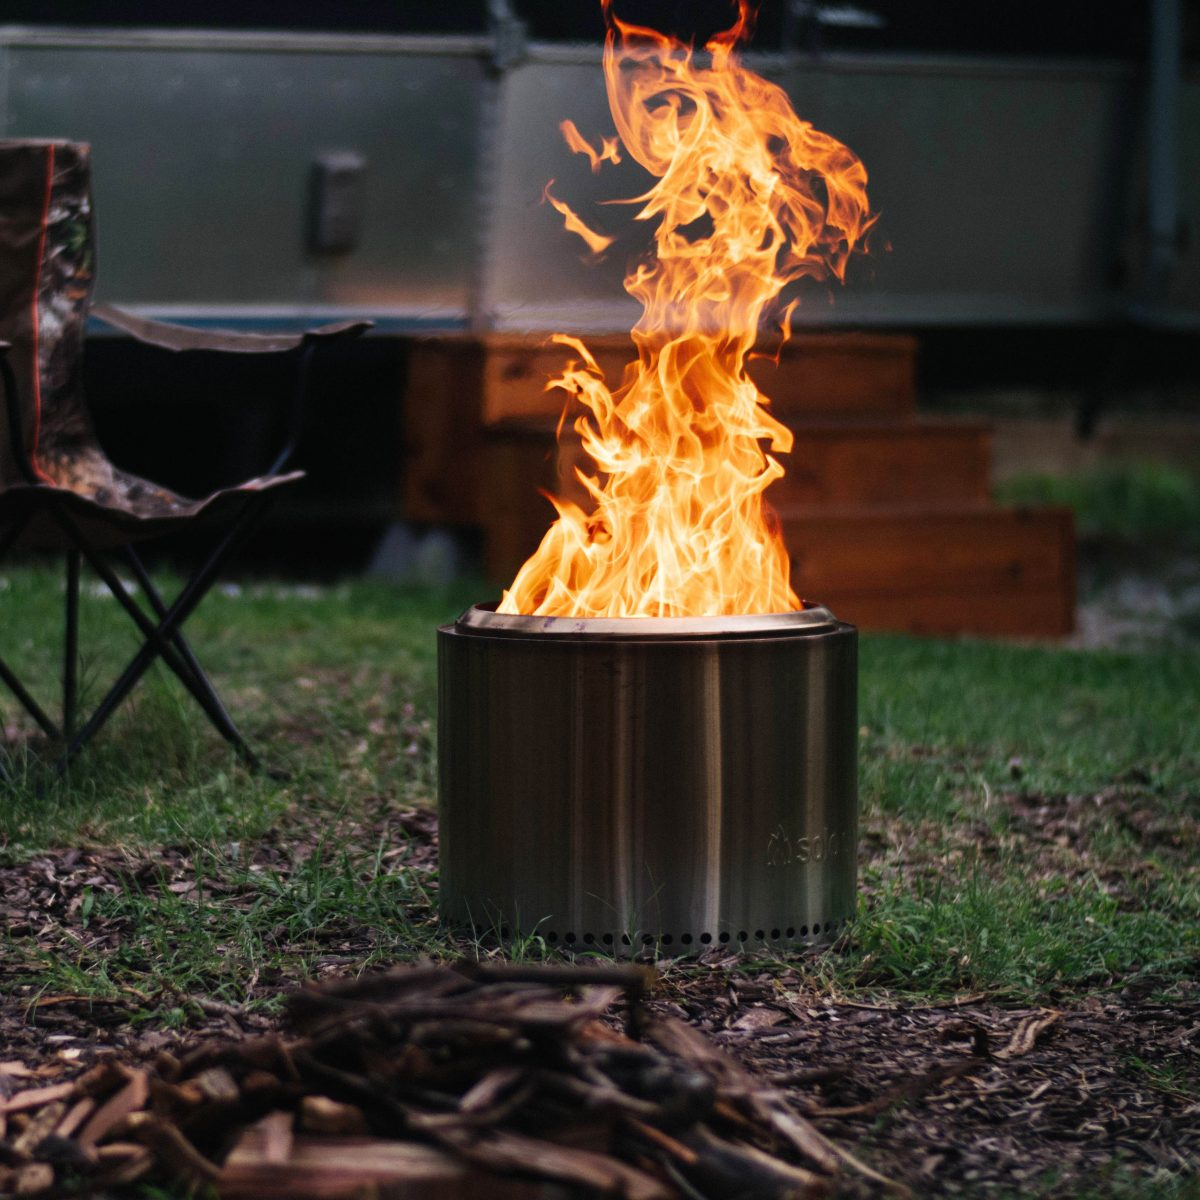 solo stove bonfire camp site